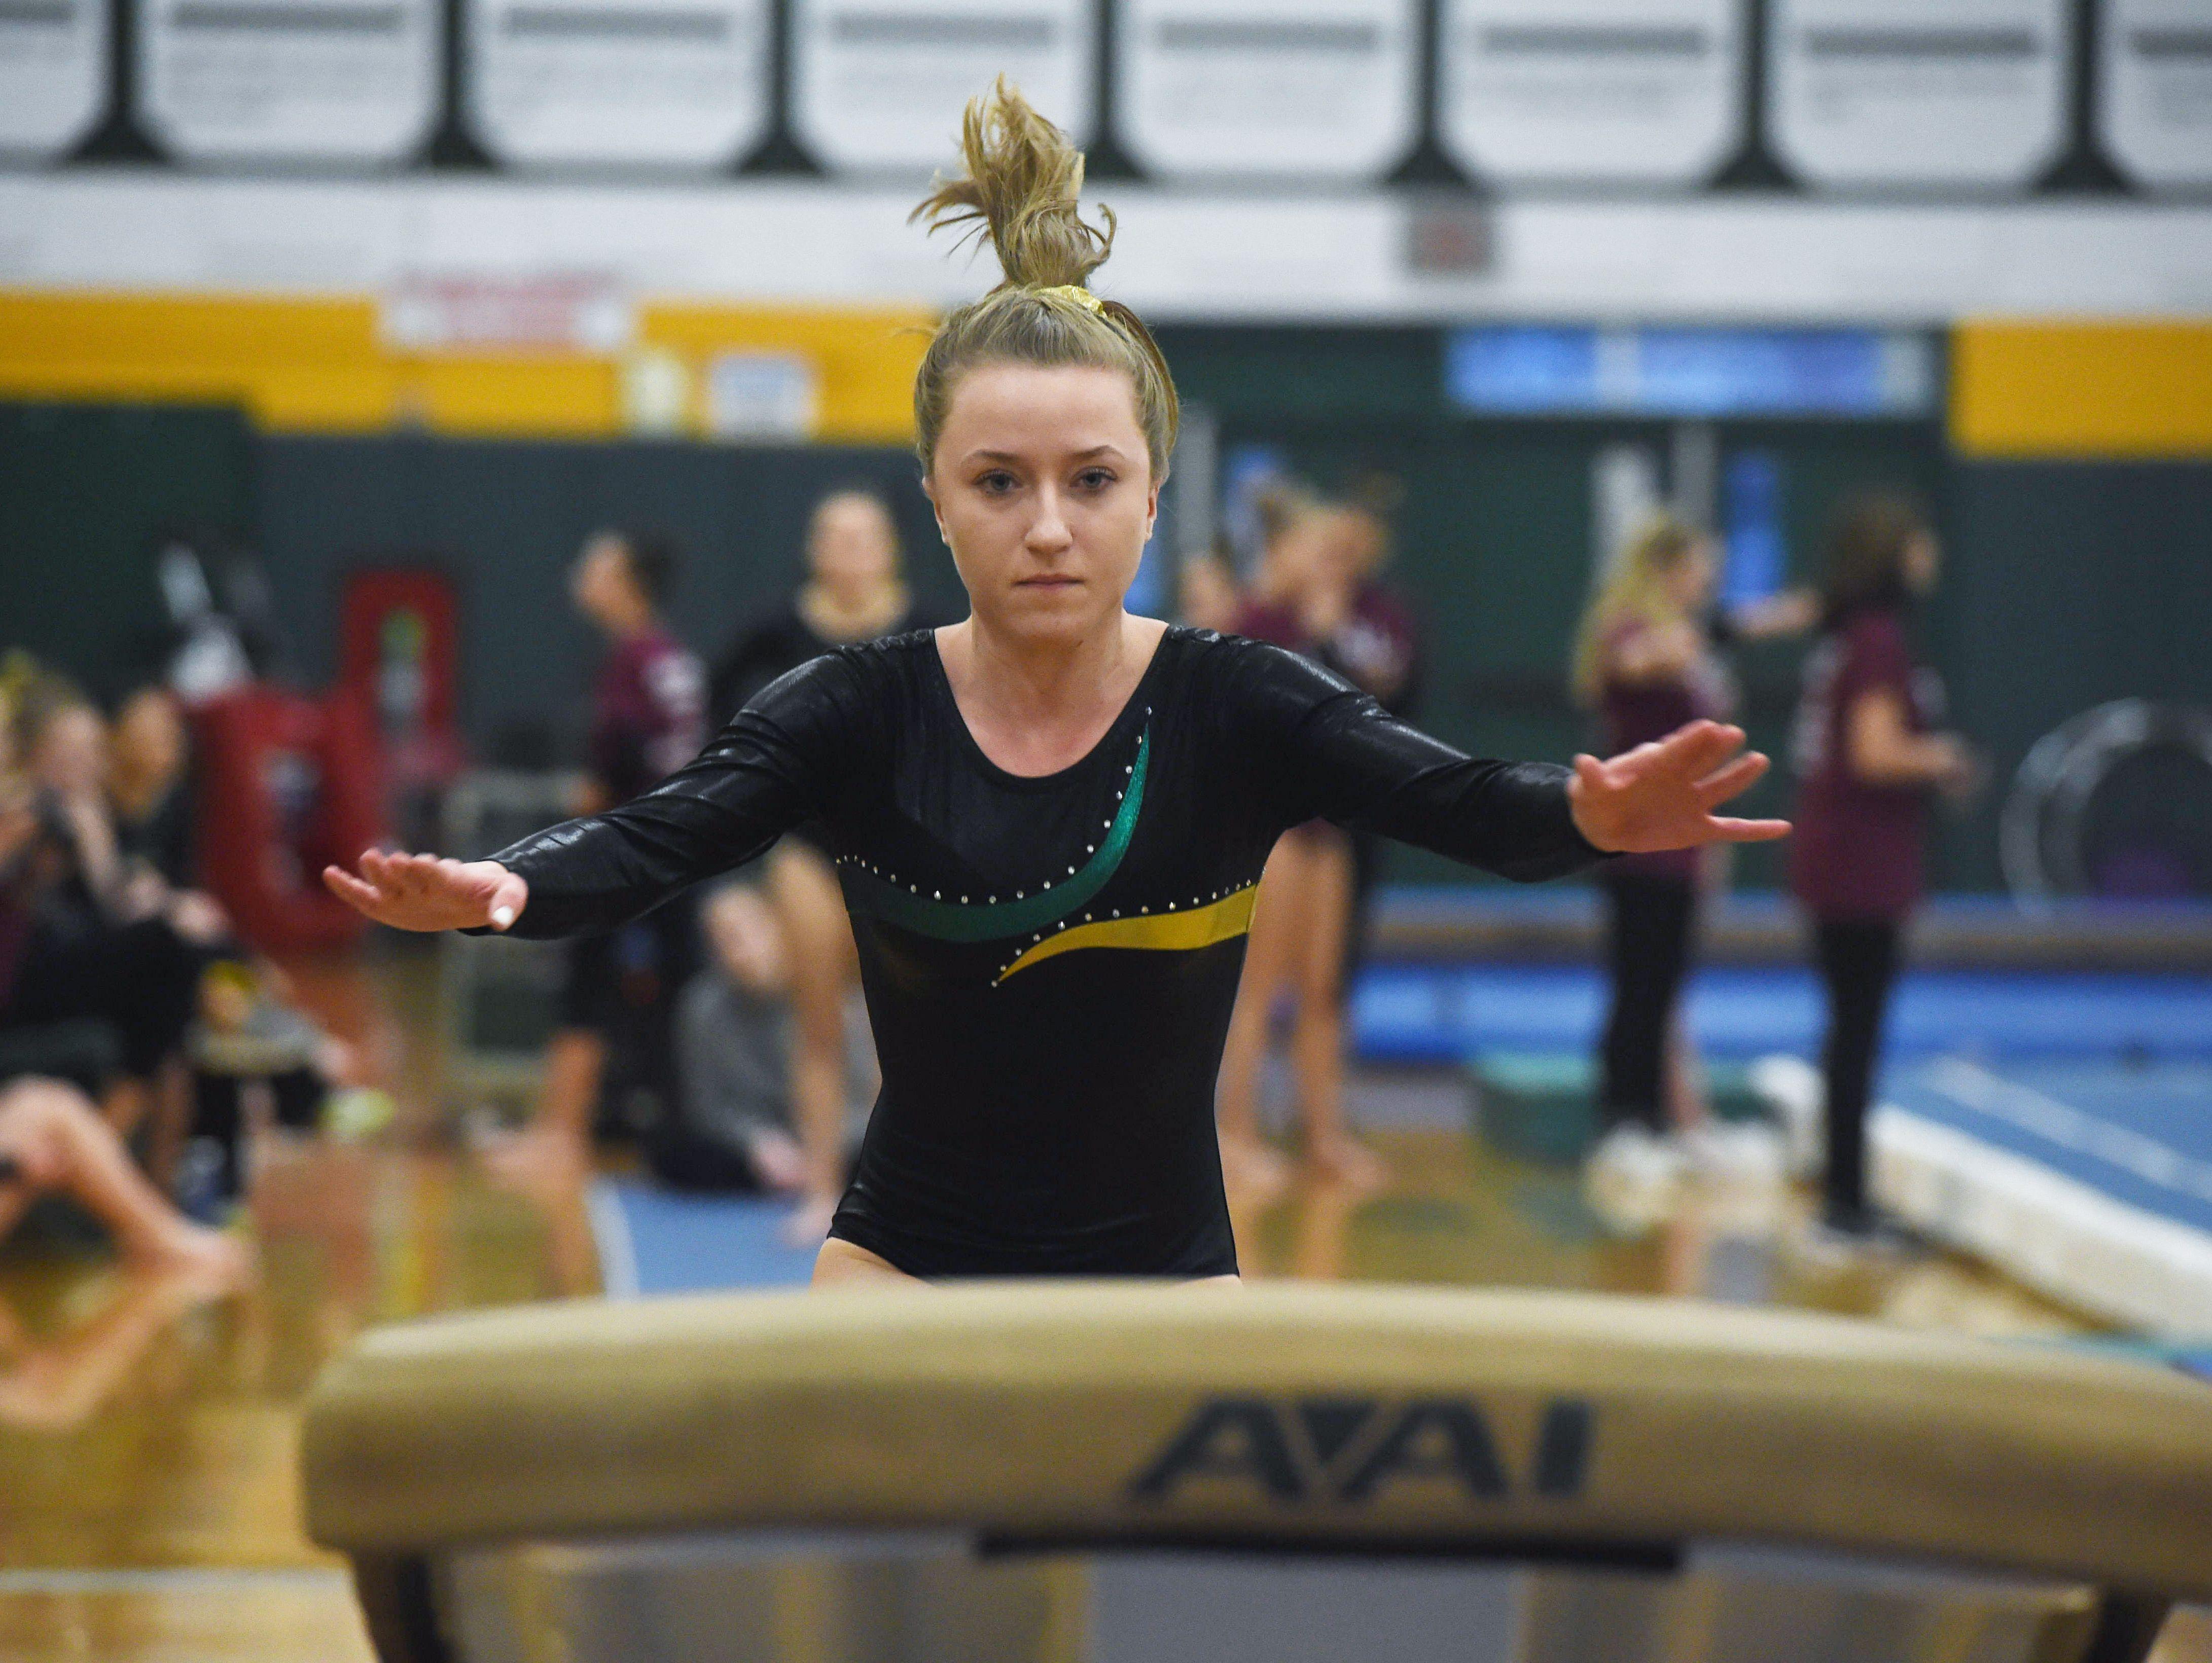 FDR's Kaelin Grant vaults during the Katie Filiberti Memorial Gymnastics Invitational at FDR High School.